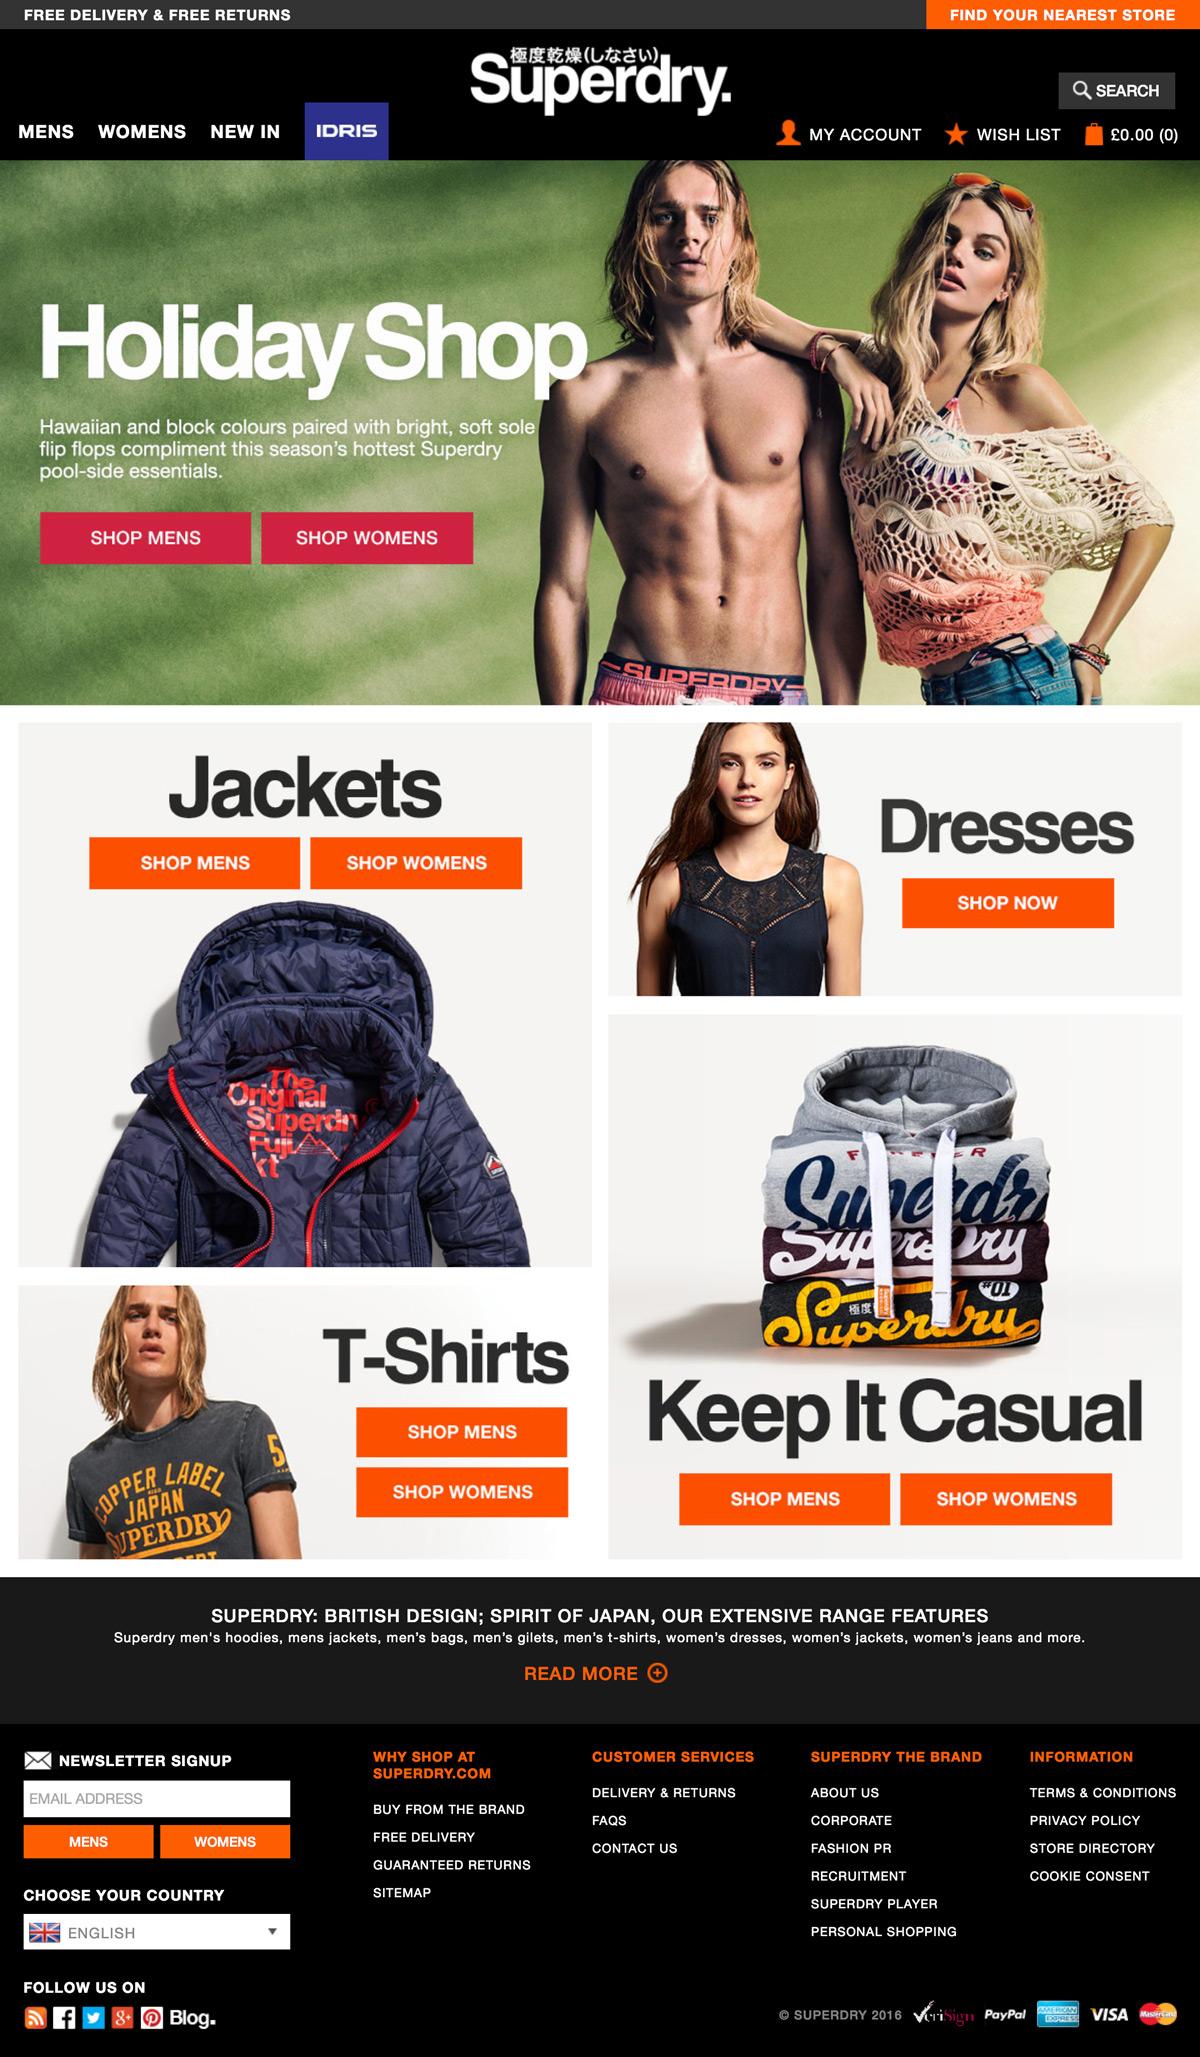 eCommerce website: Superdry